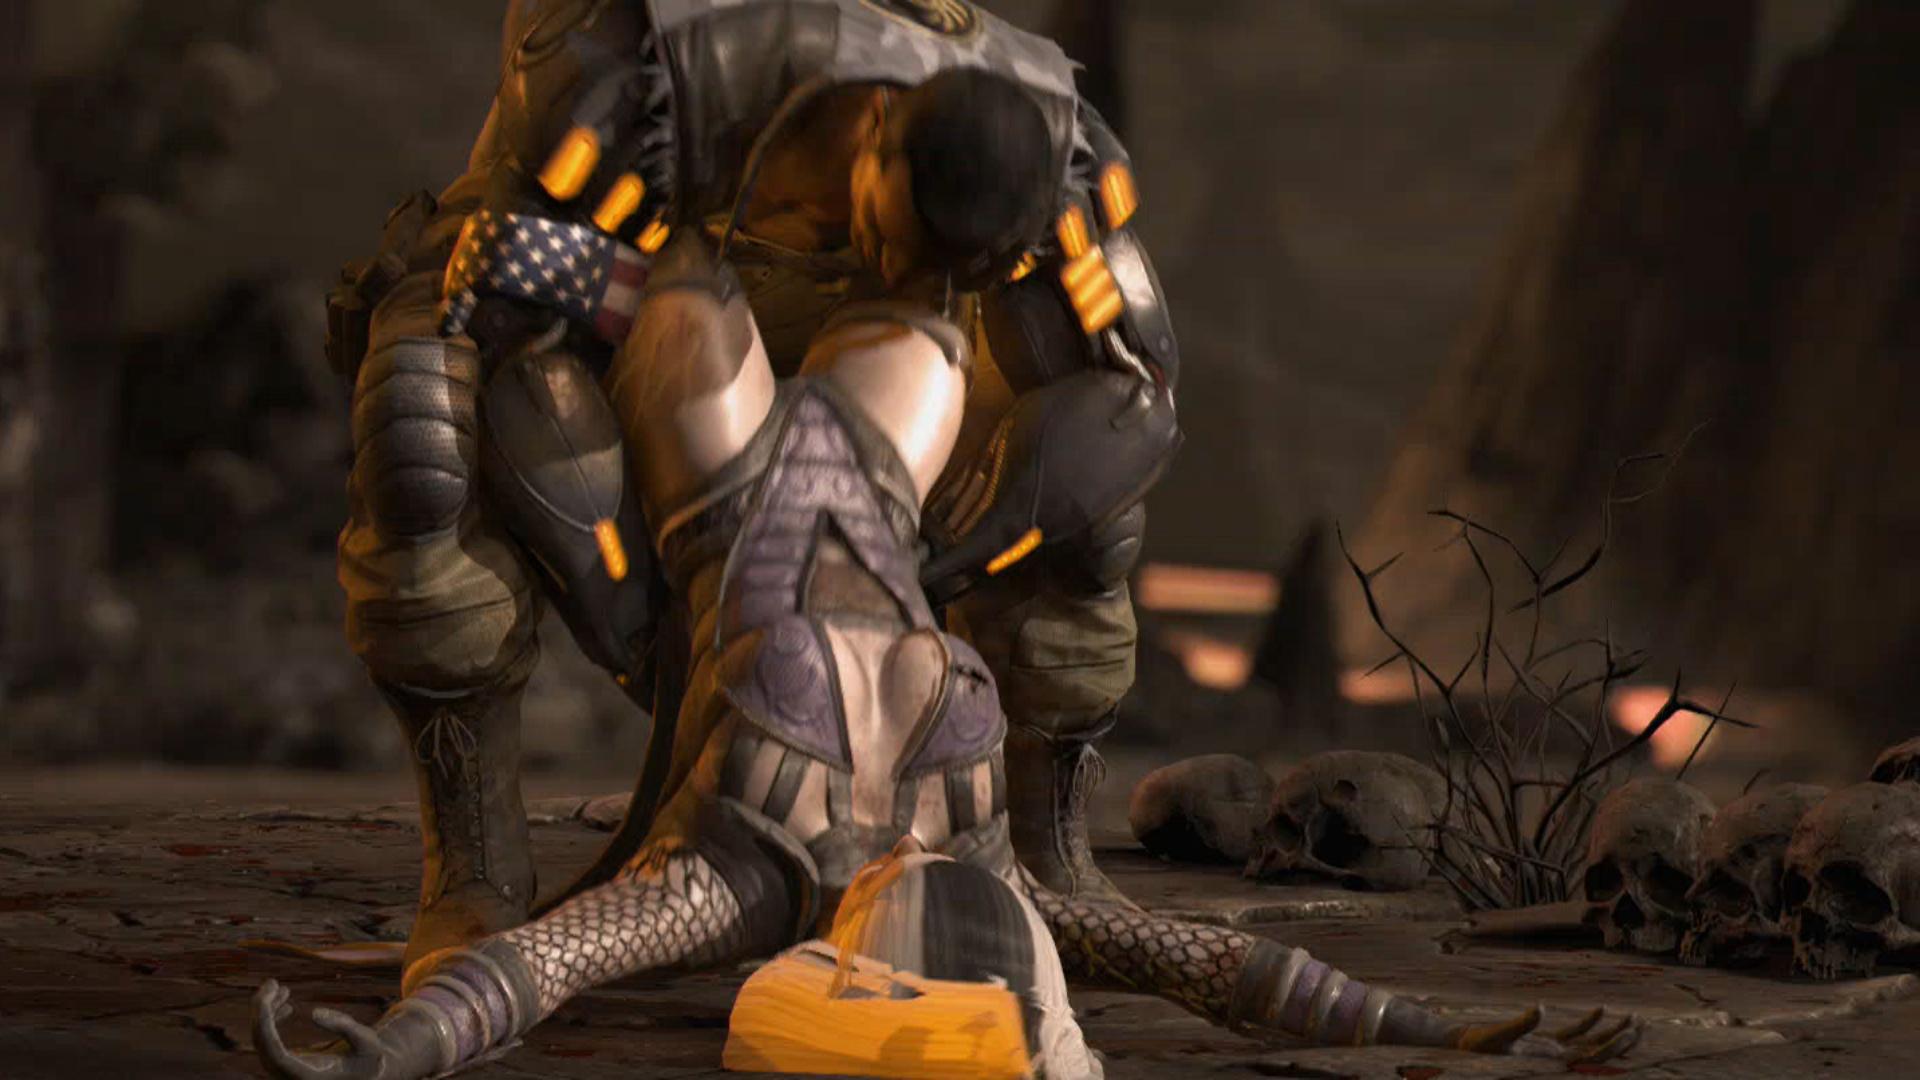 Mortal Kombat X R3dplaystation Review R3dplaystation